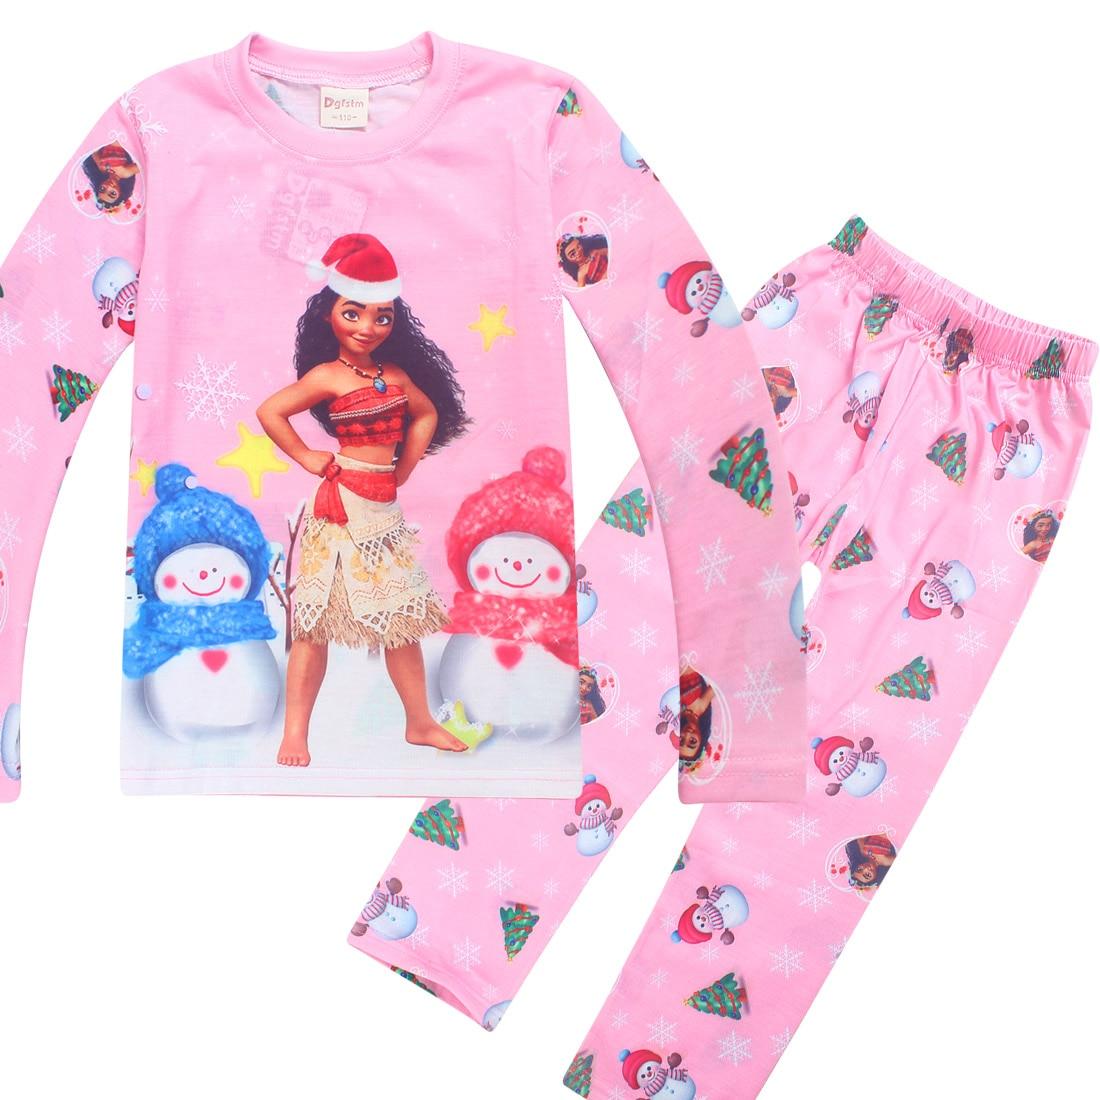 Toddler Girls Pajama Set Long sleeve Cartoon Printing Tee &pants 4-10 years children Winter Moana Christmas Children Nightwear